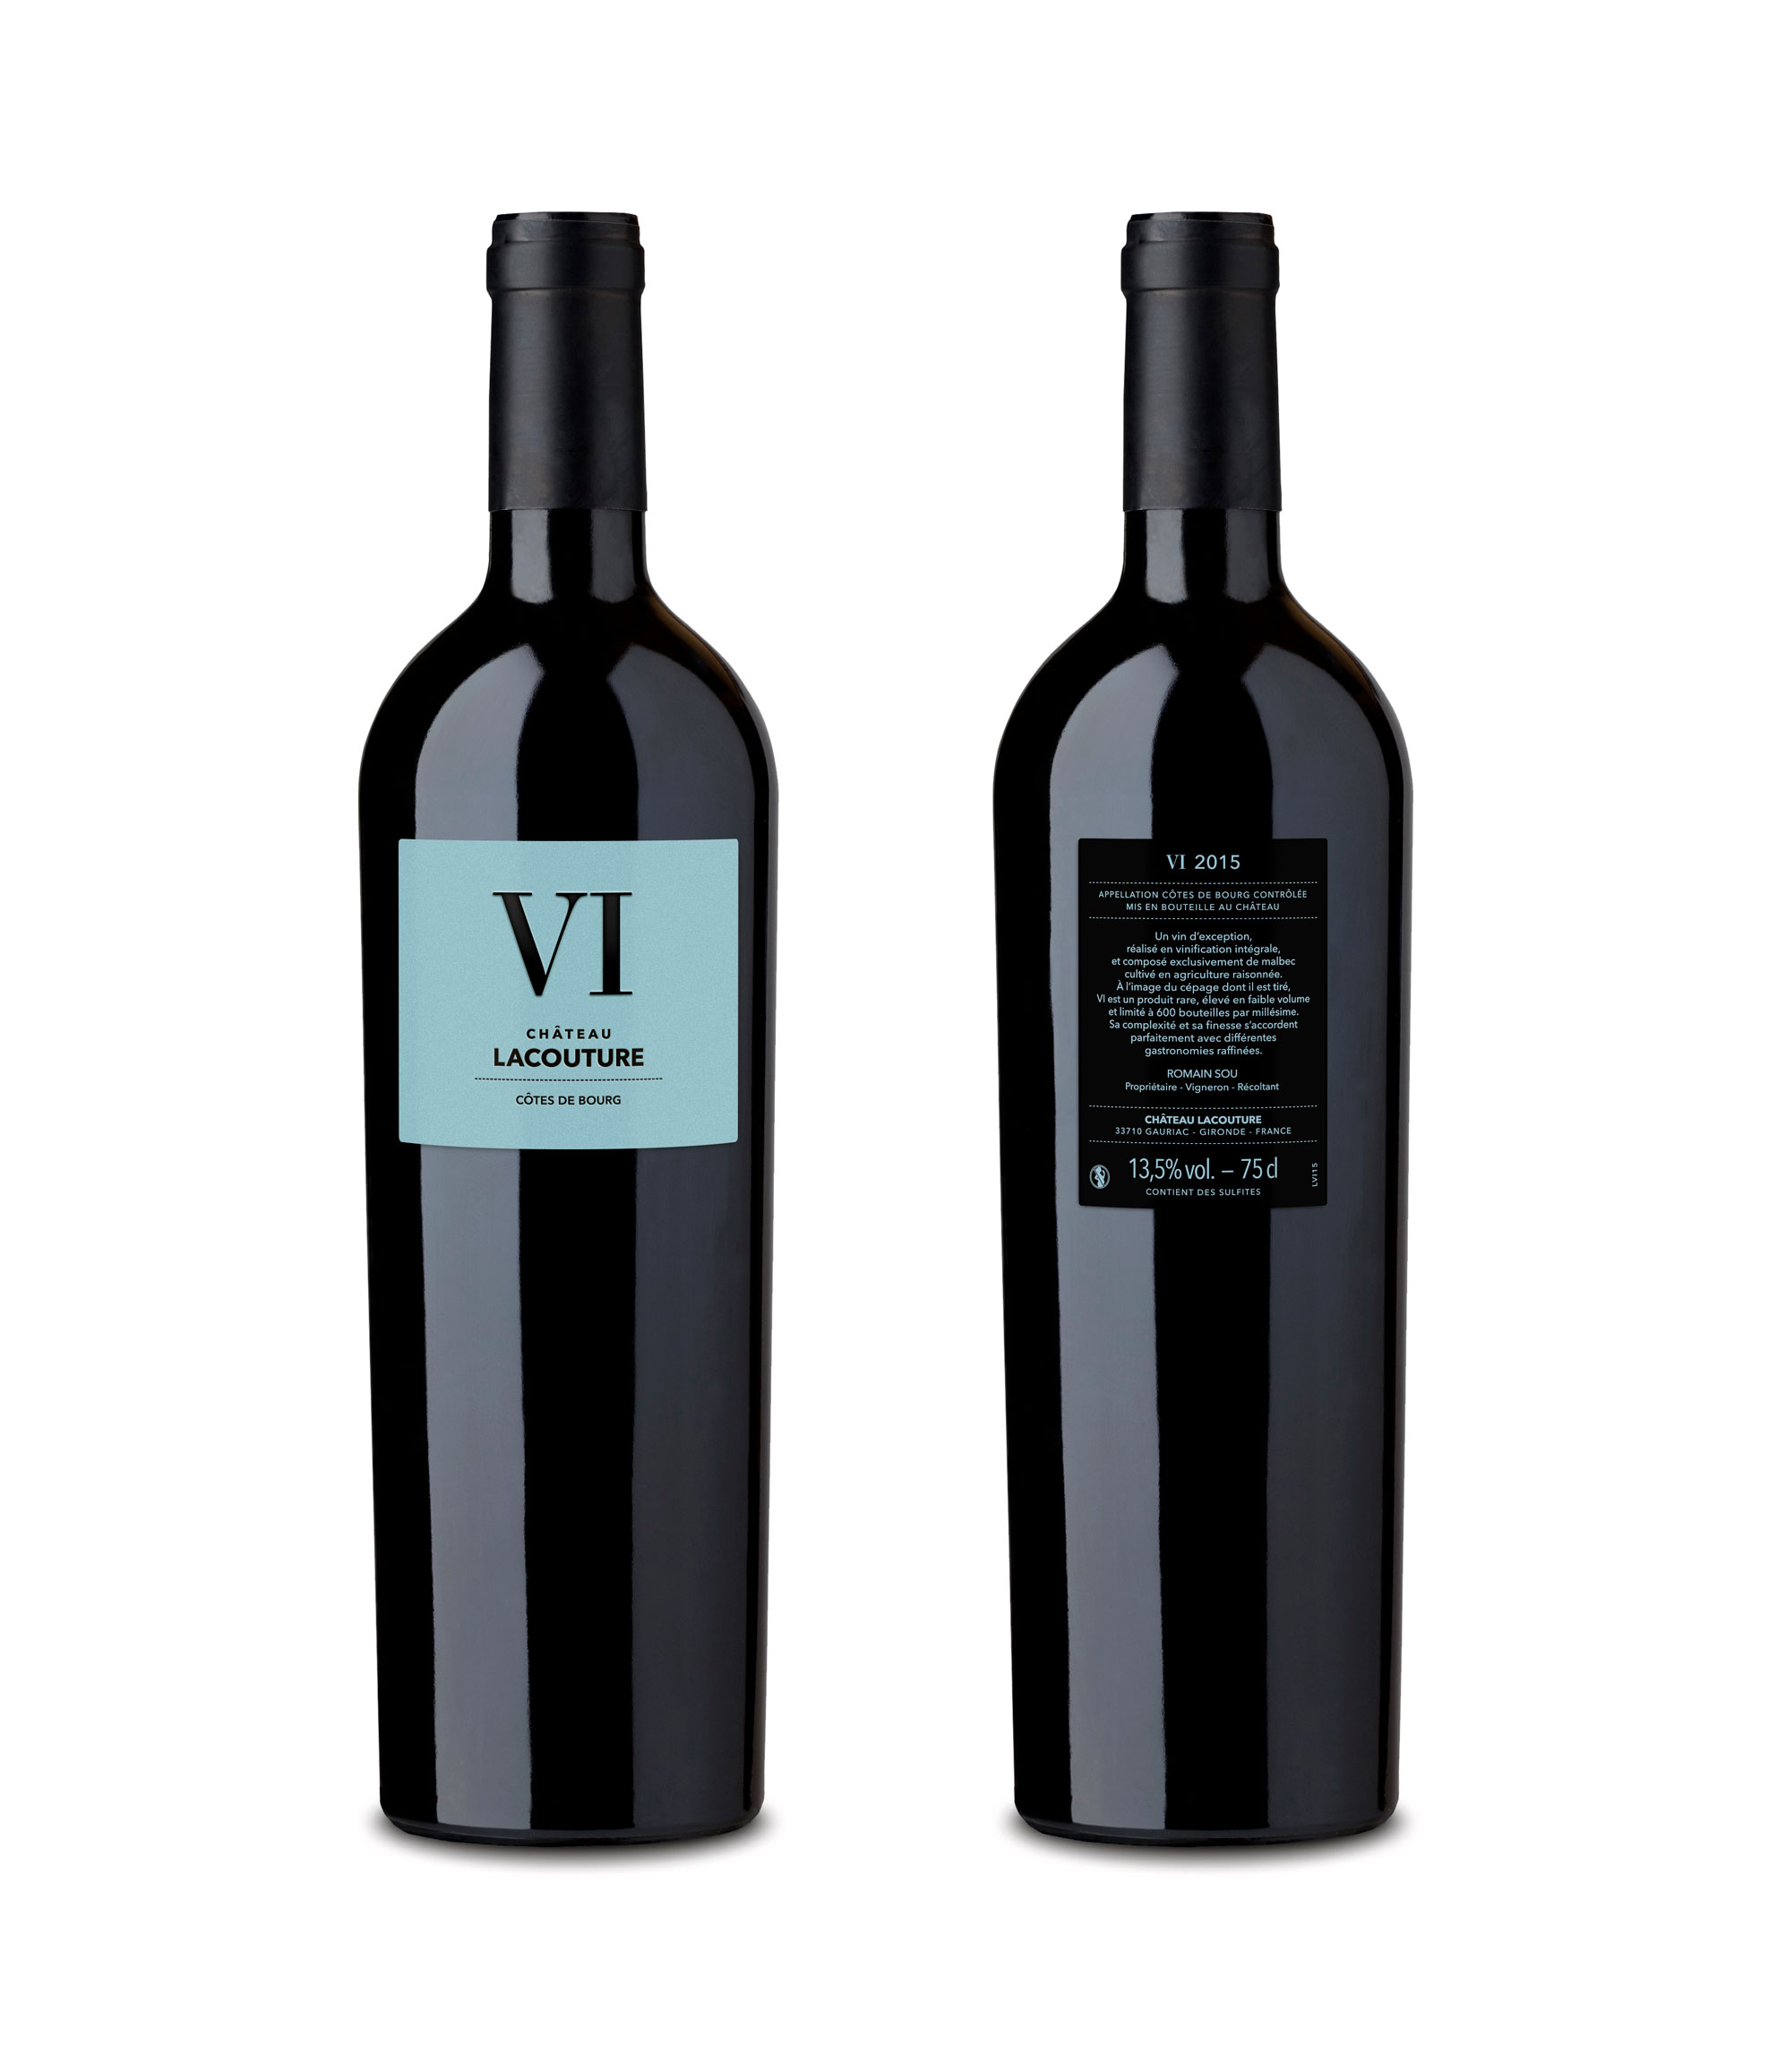 creation-design-graphique-packaging-etiquette-vin-prestige-nico-nico-nicolas-vignais-designer-graphique-independant-identite-visuelle-packaging-bordeaux-france-2